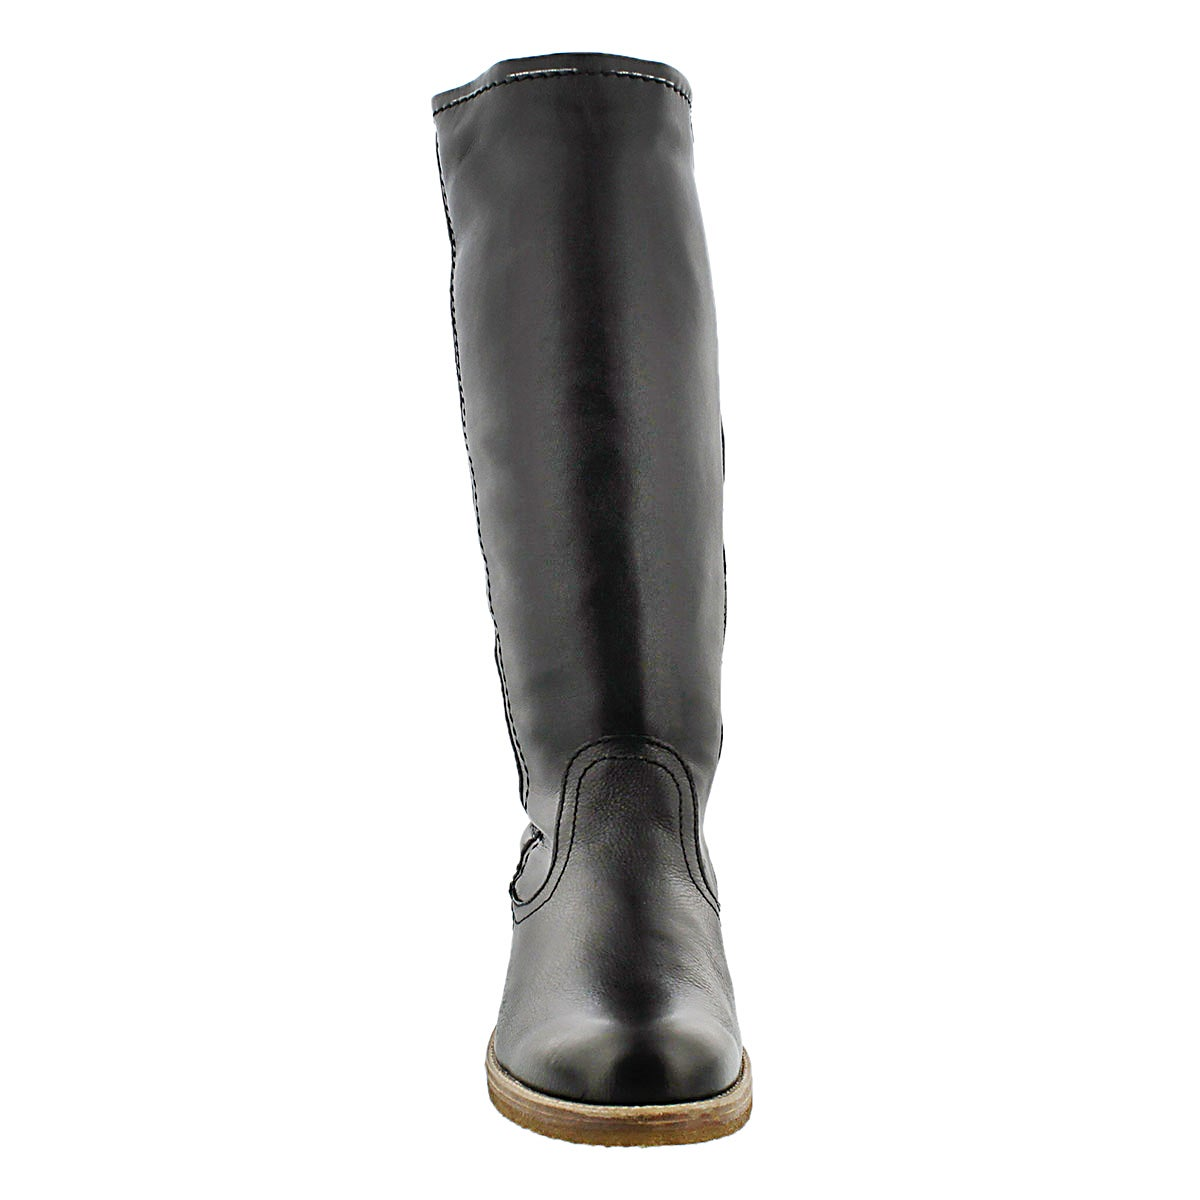 Lds Tamara 03 blk lthr casual tall boot